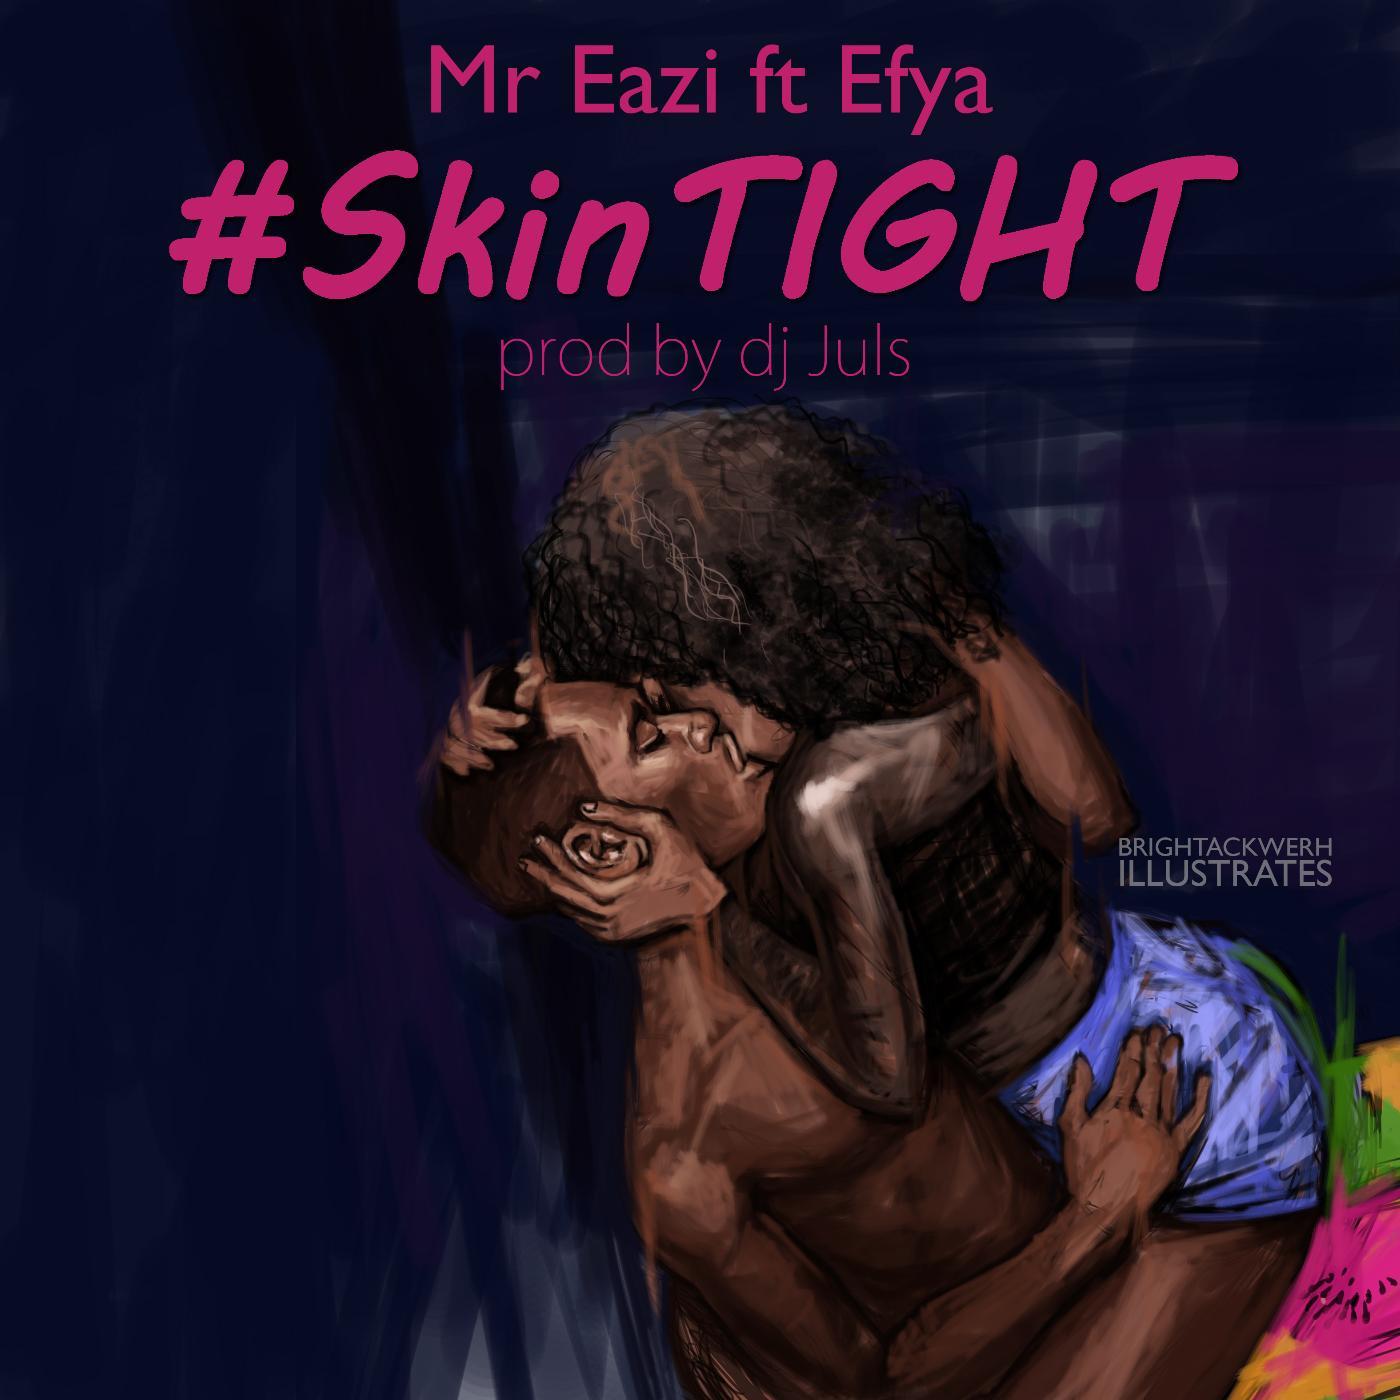 Listen Free to Mr Eazi - Skin Tight (feat. Efya) Radio